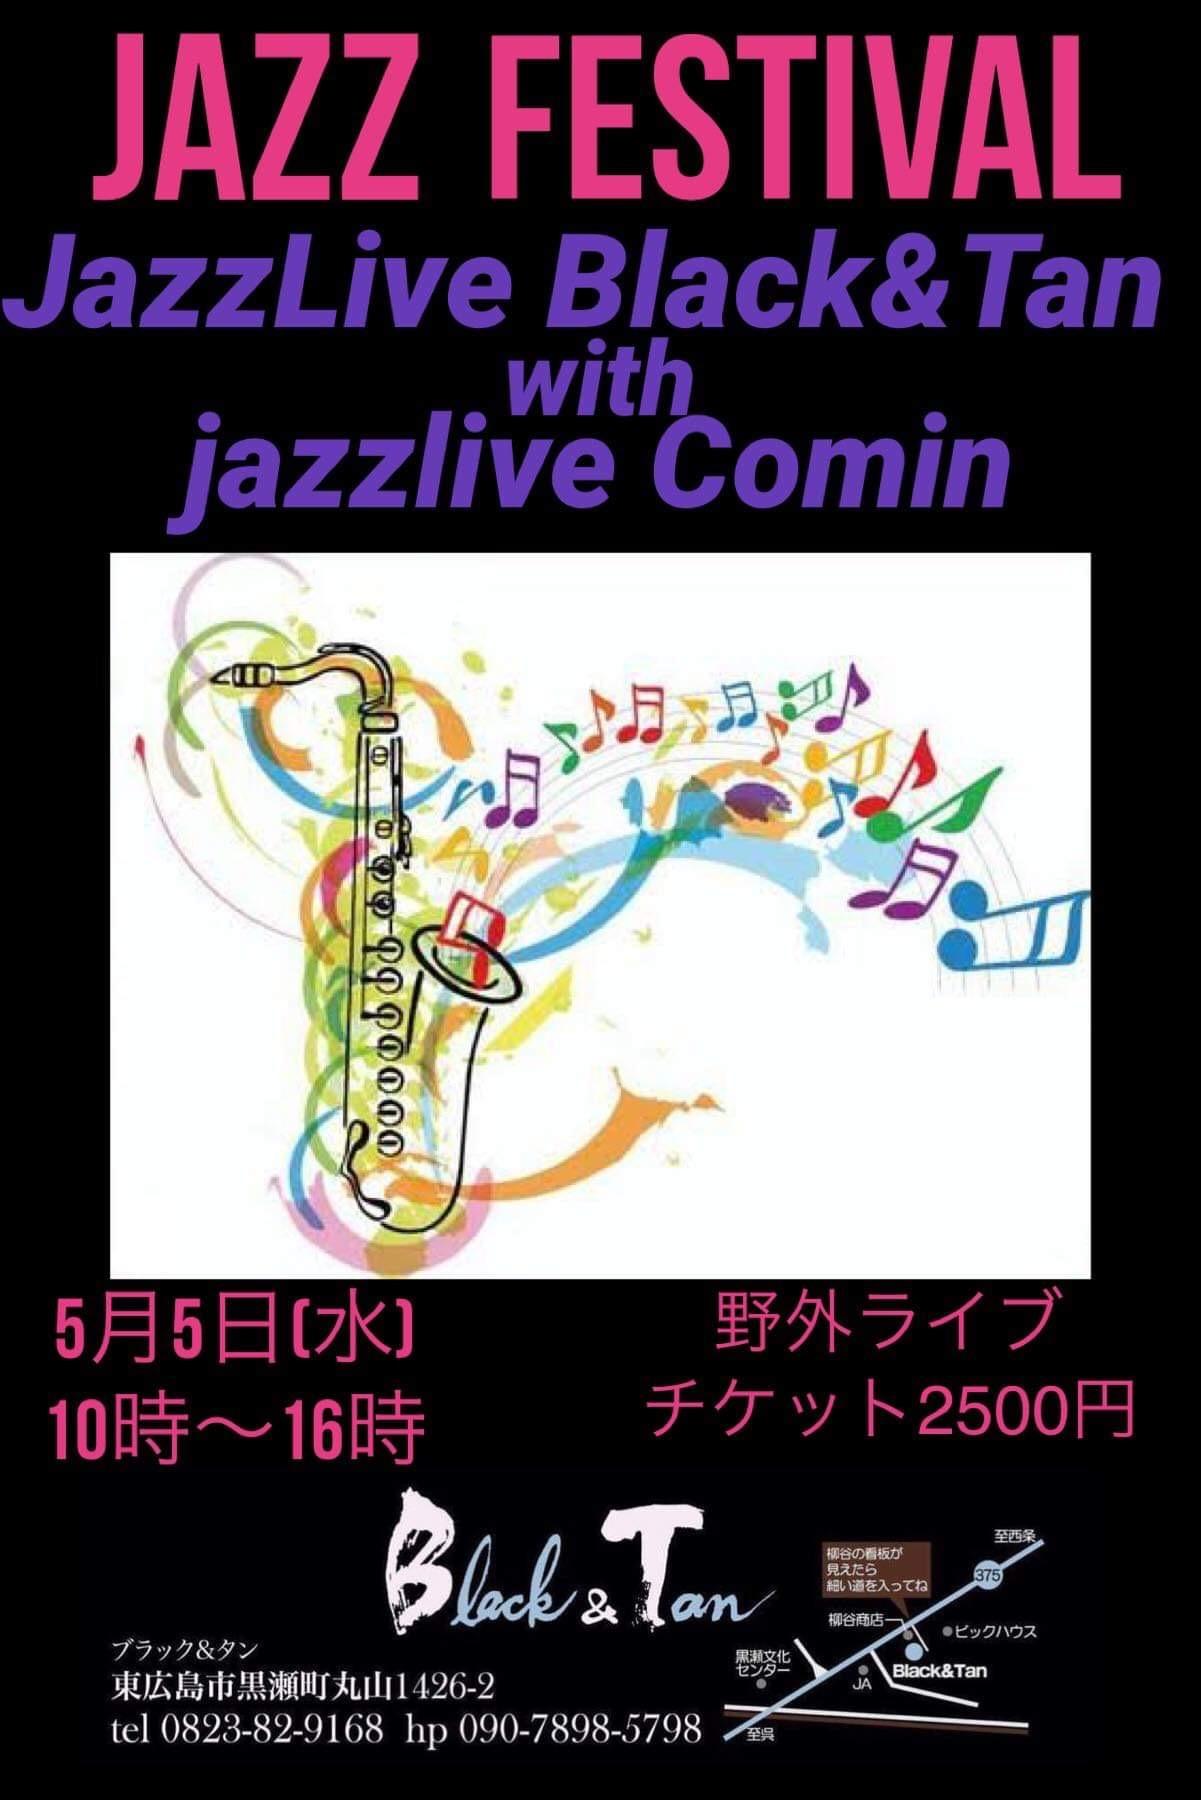 Jazzlive Comin 広島 ジャズライブカミン 5月のスケジュール_b0115606_10452416.jpeg